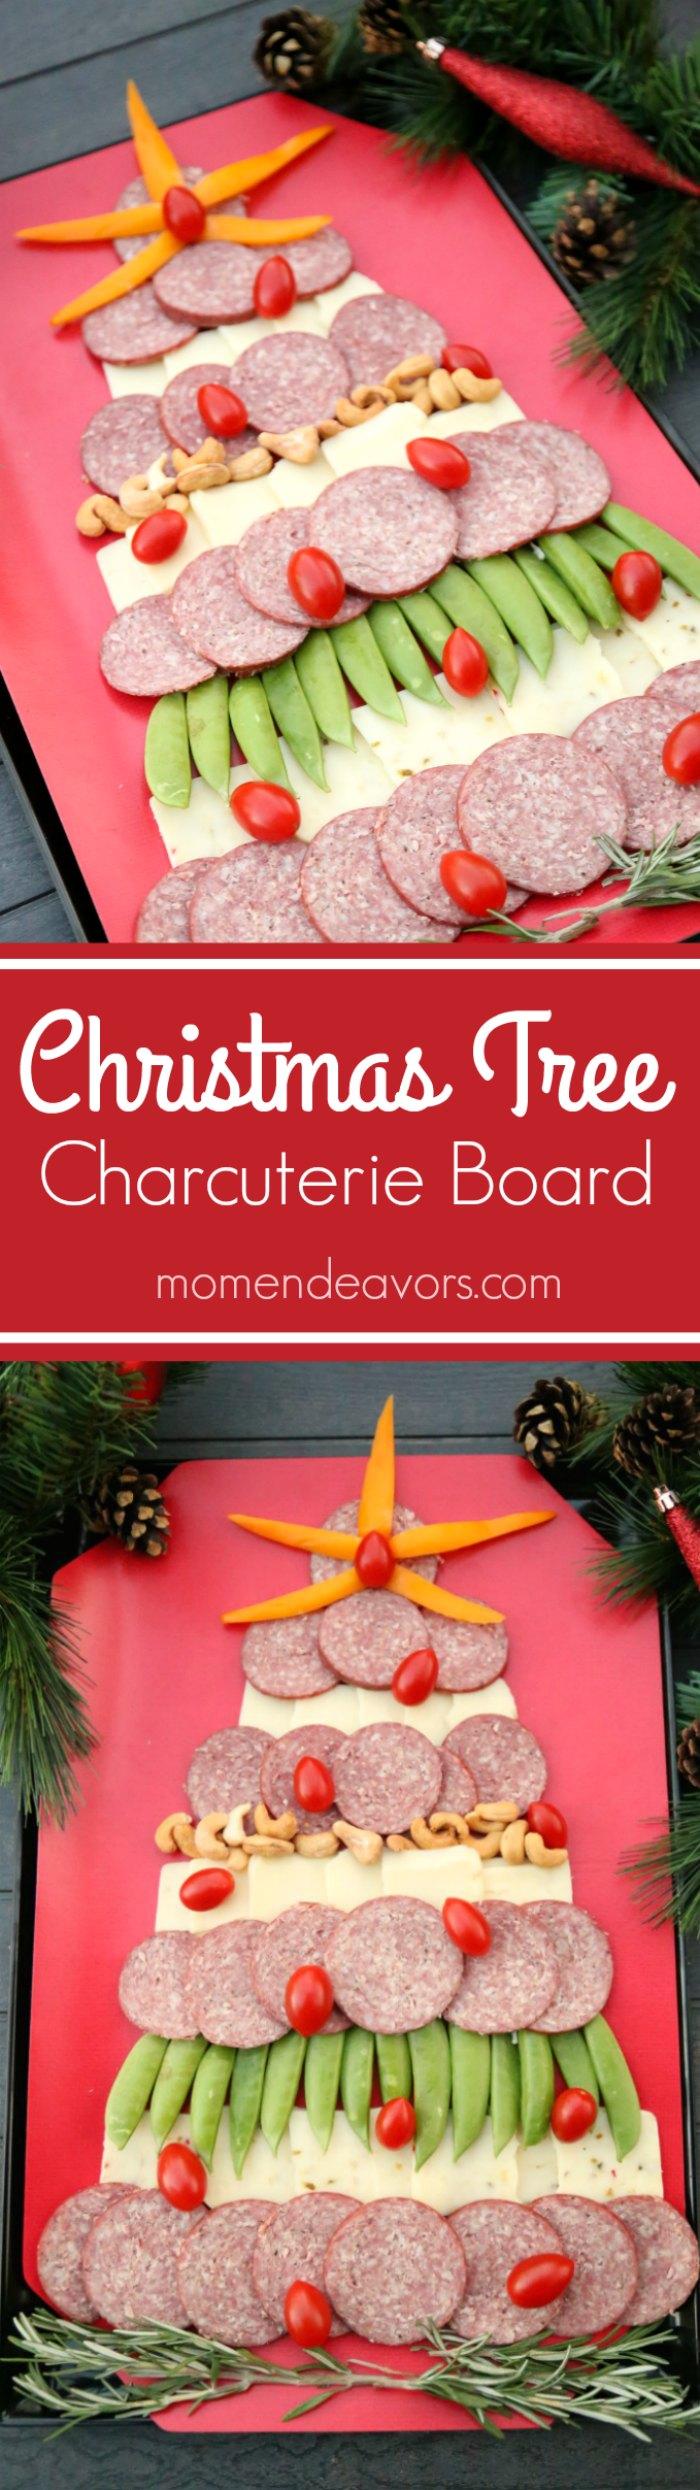 christmas-charcuterie